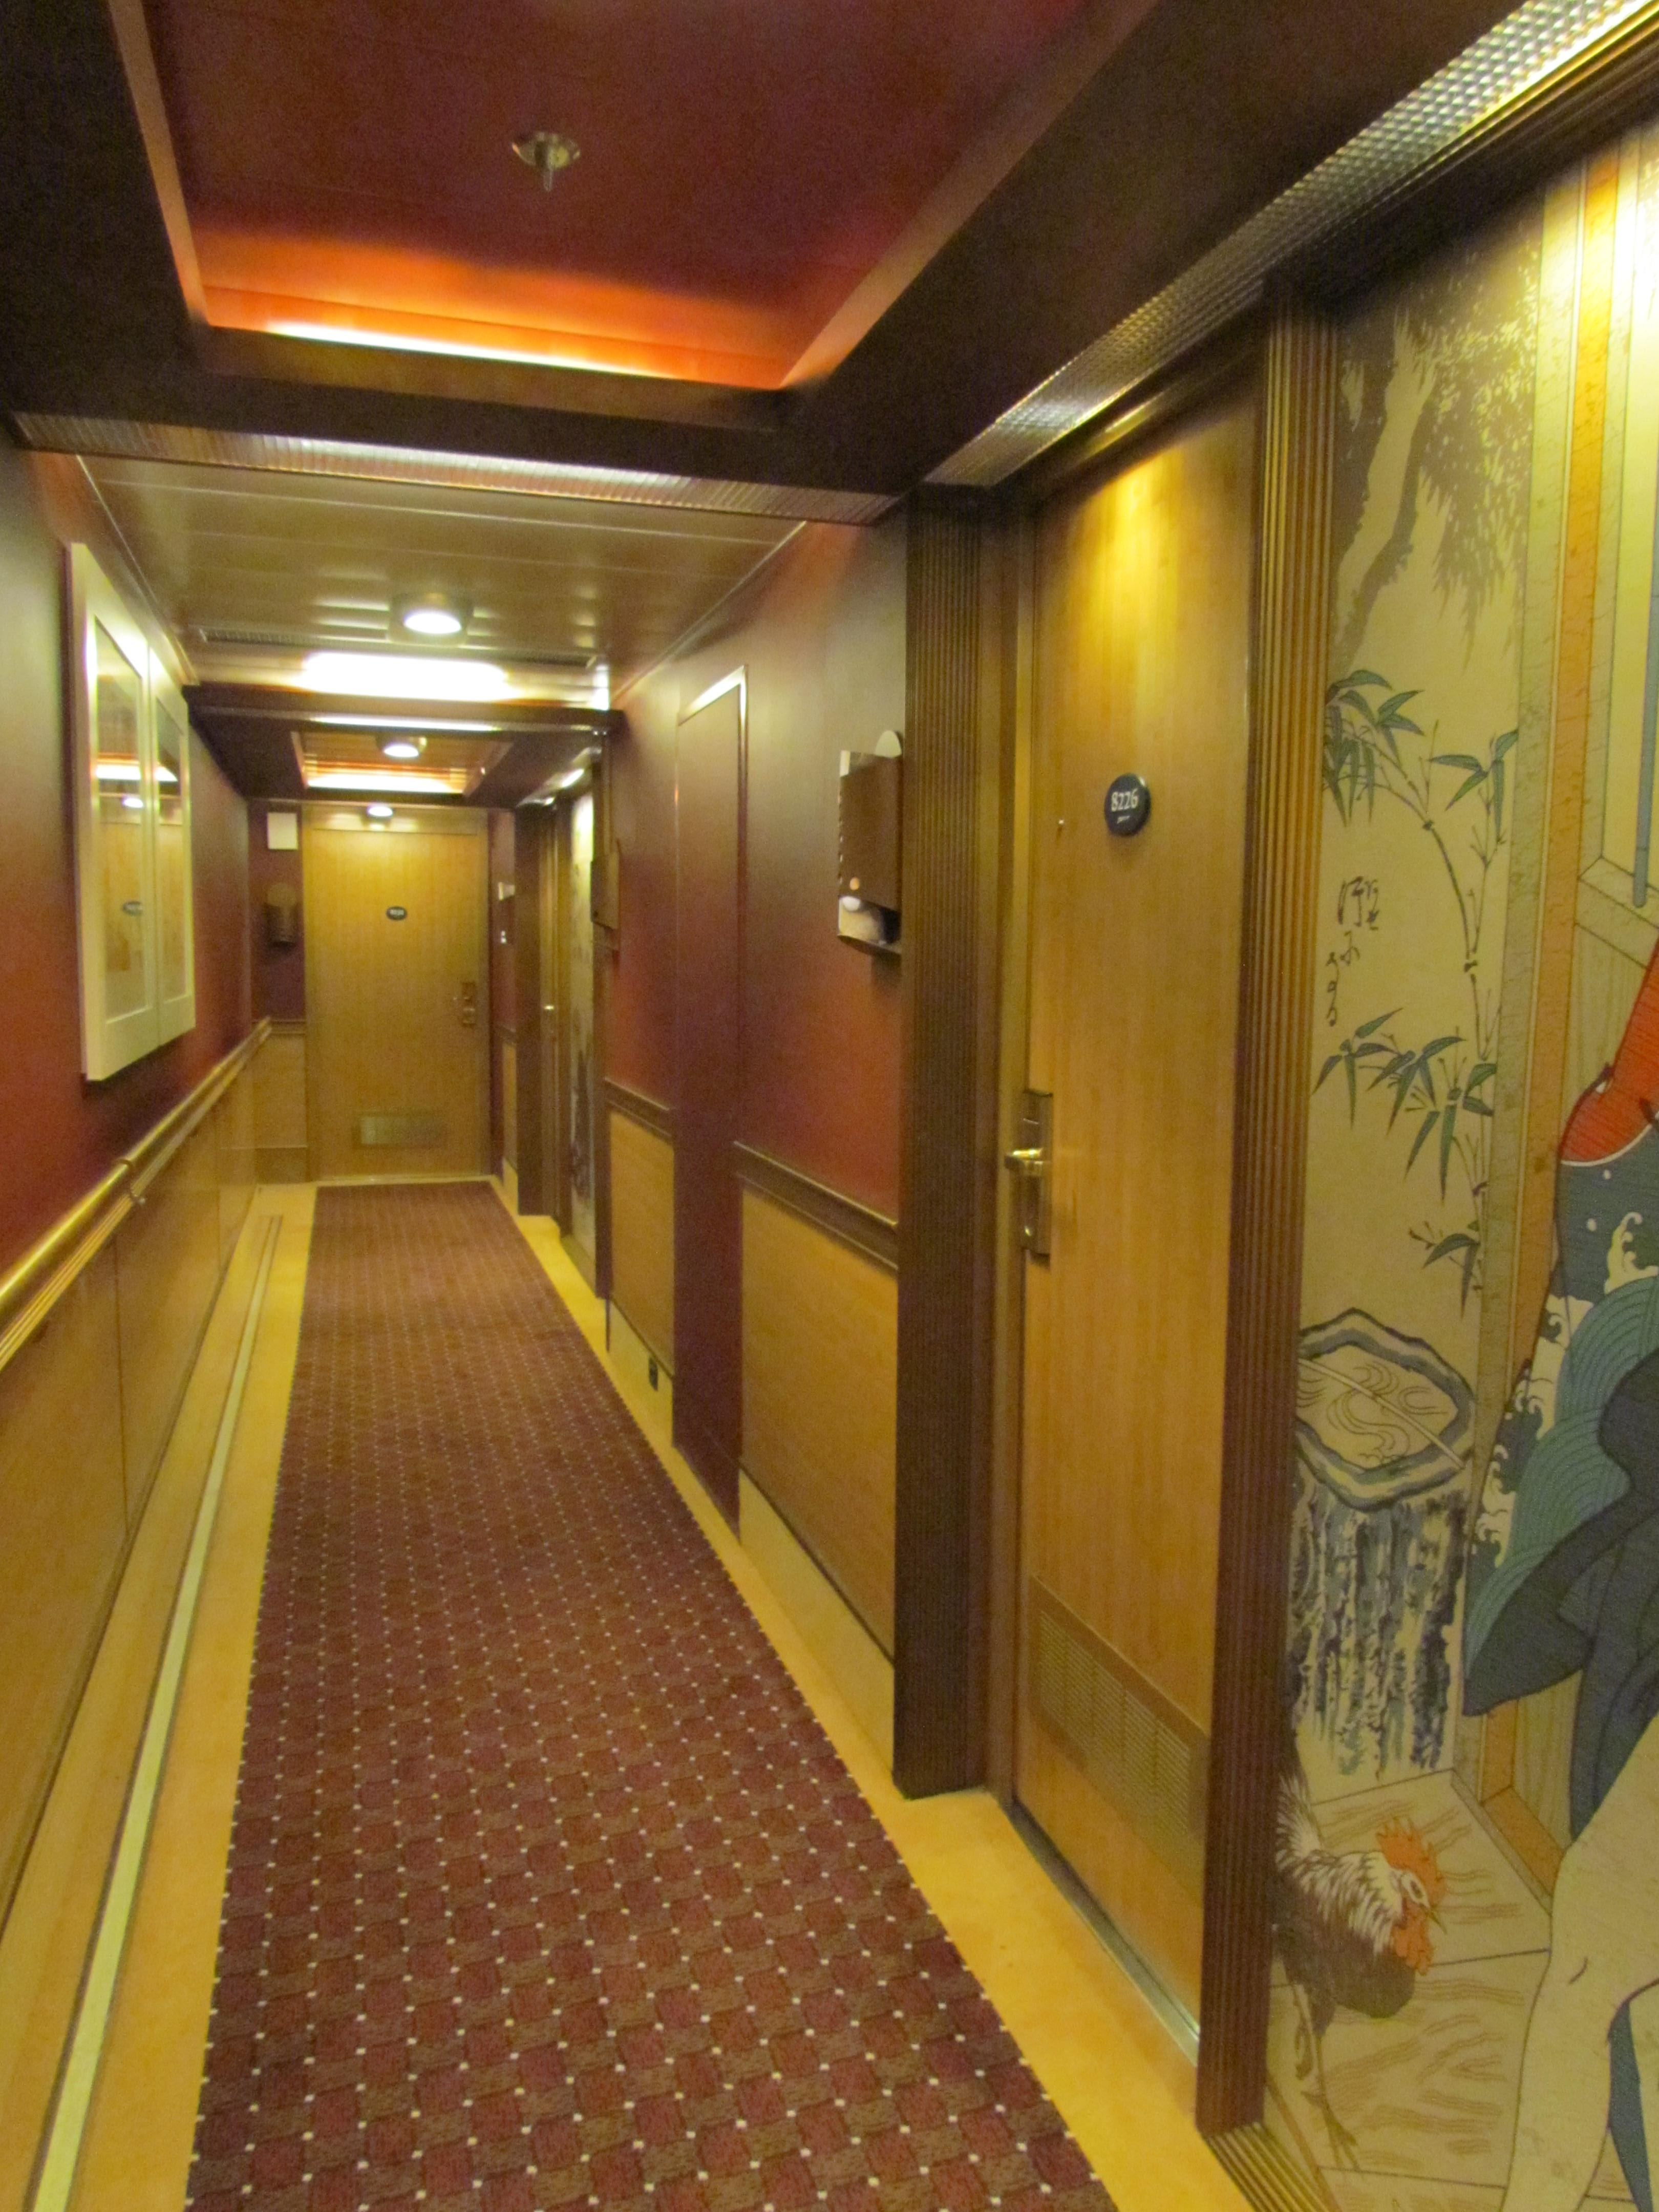 The cabin hallway.